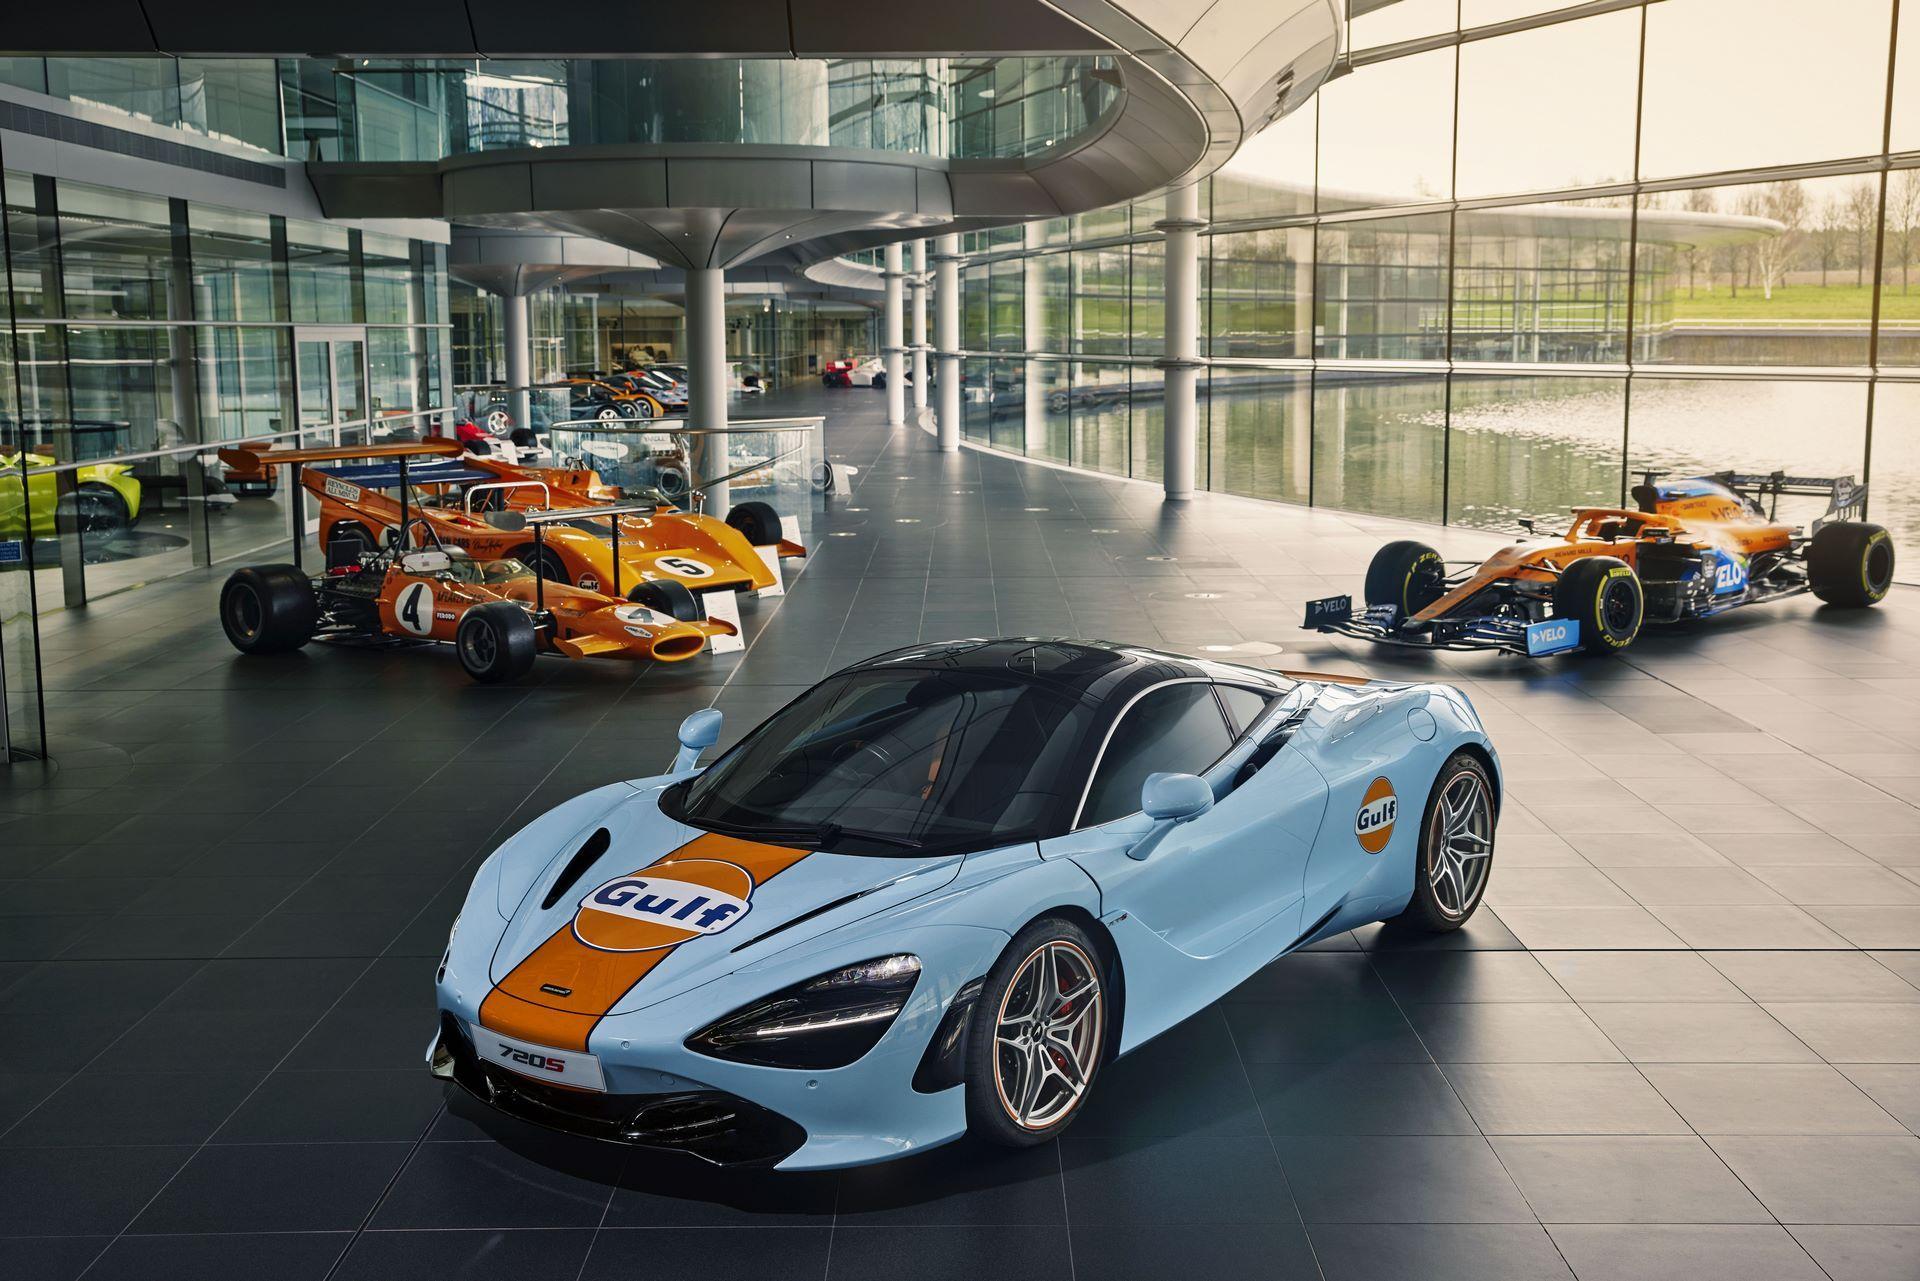 McLaren-720S-with-Gulf-livery-5